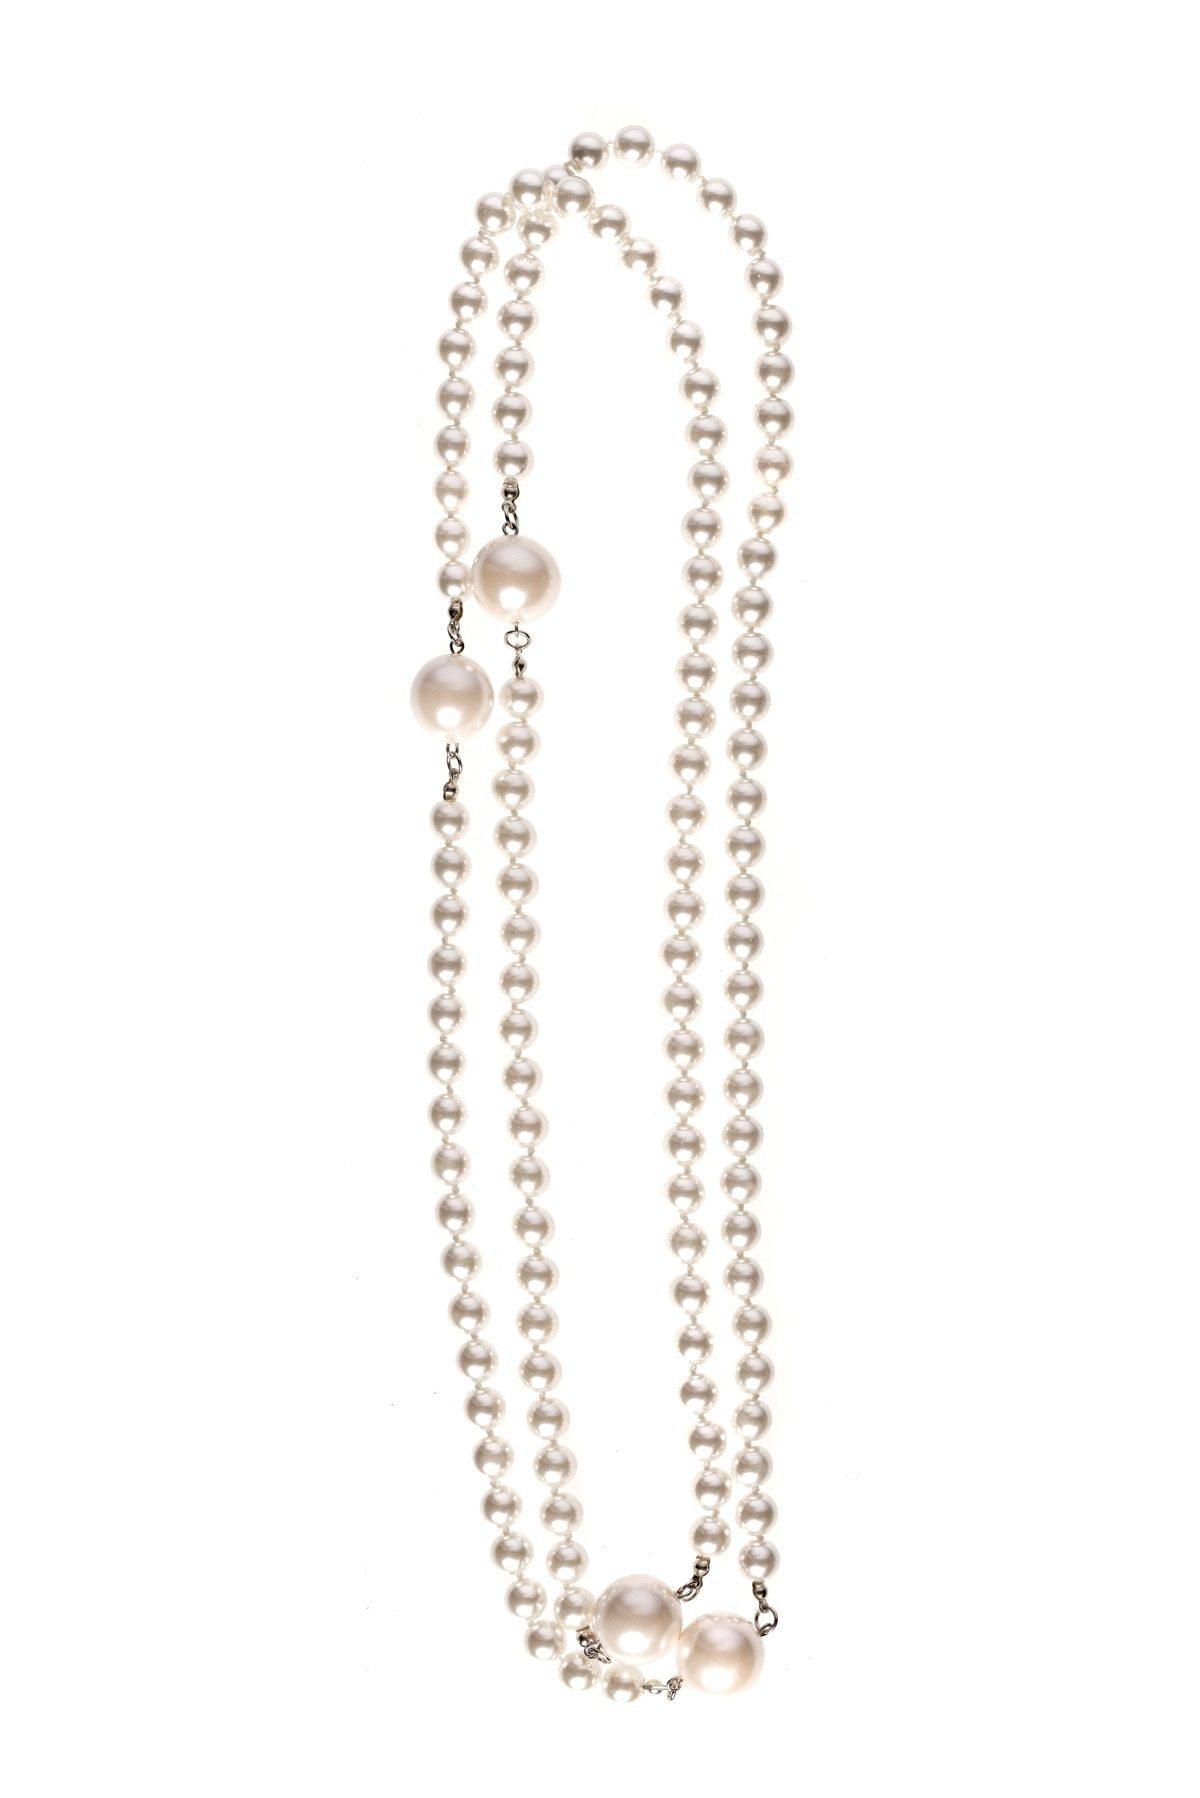 Colier cu perle Alb